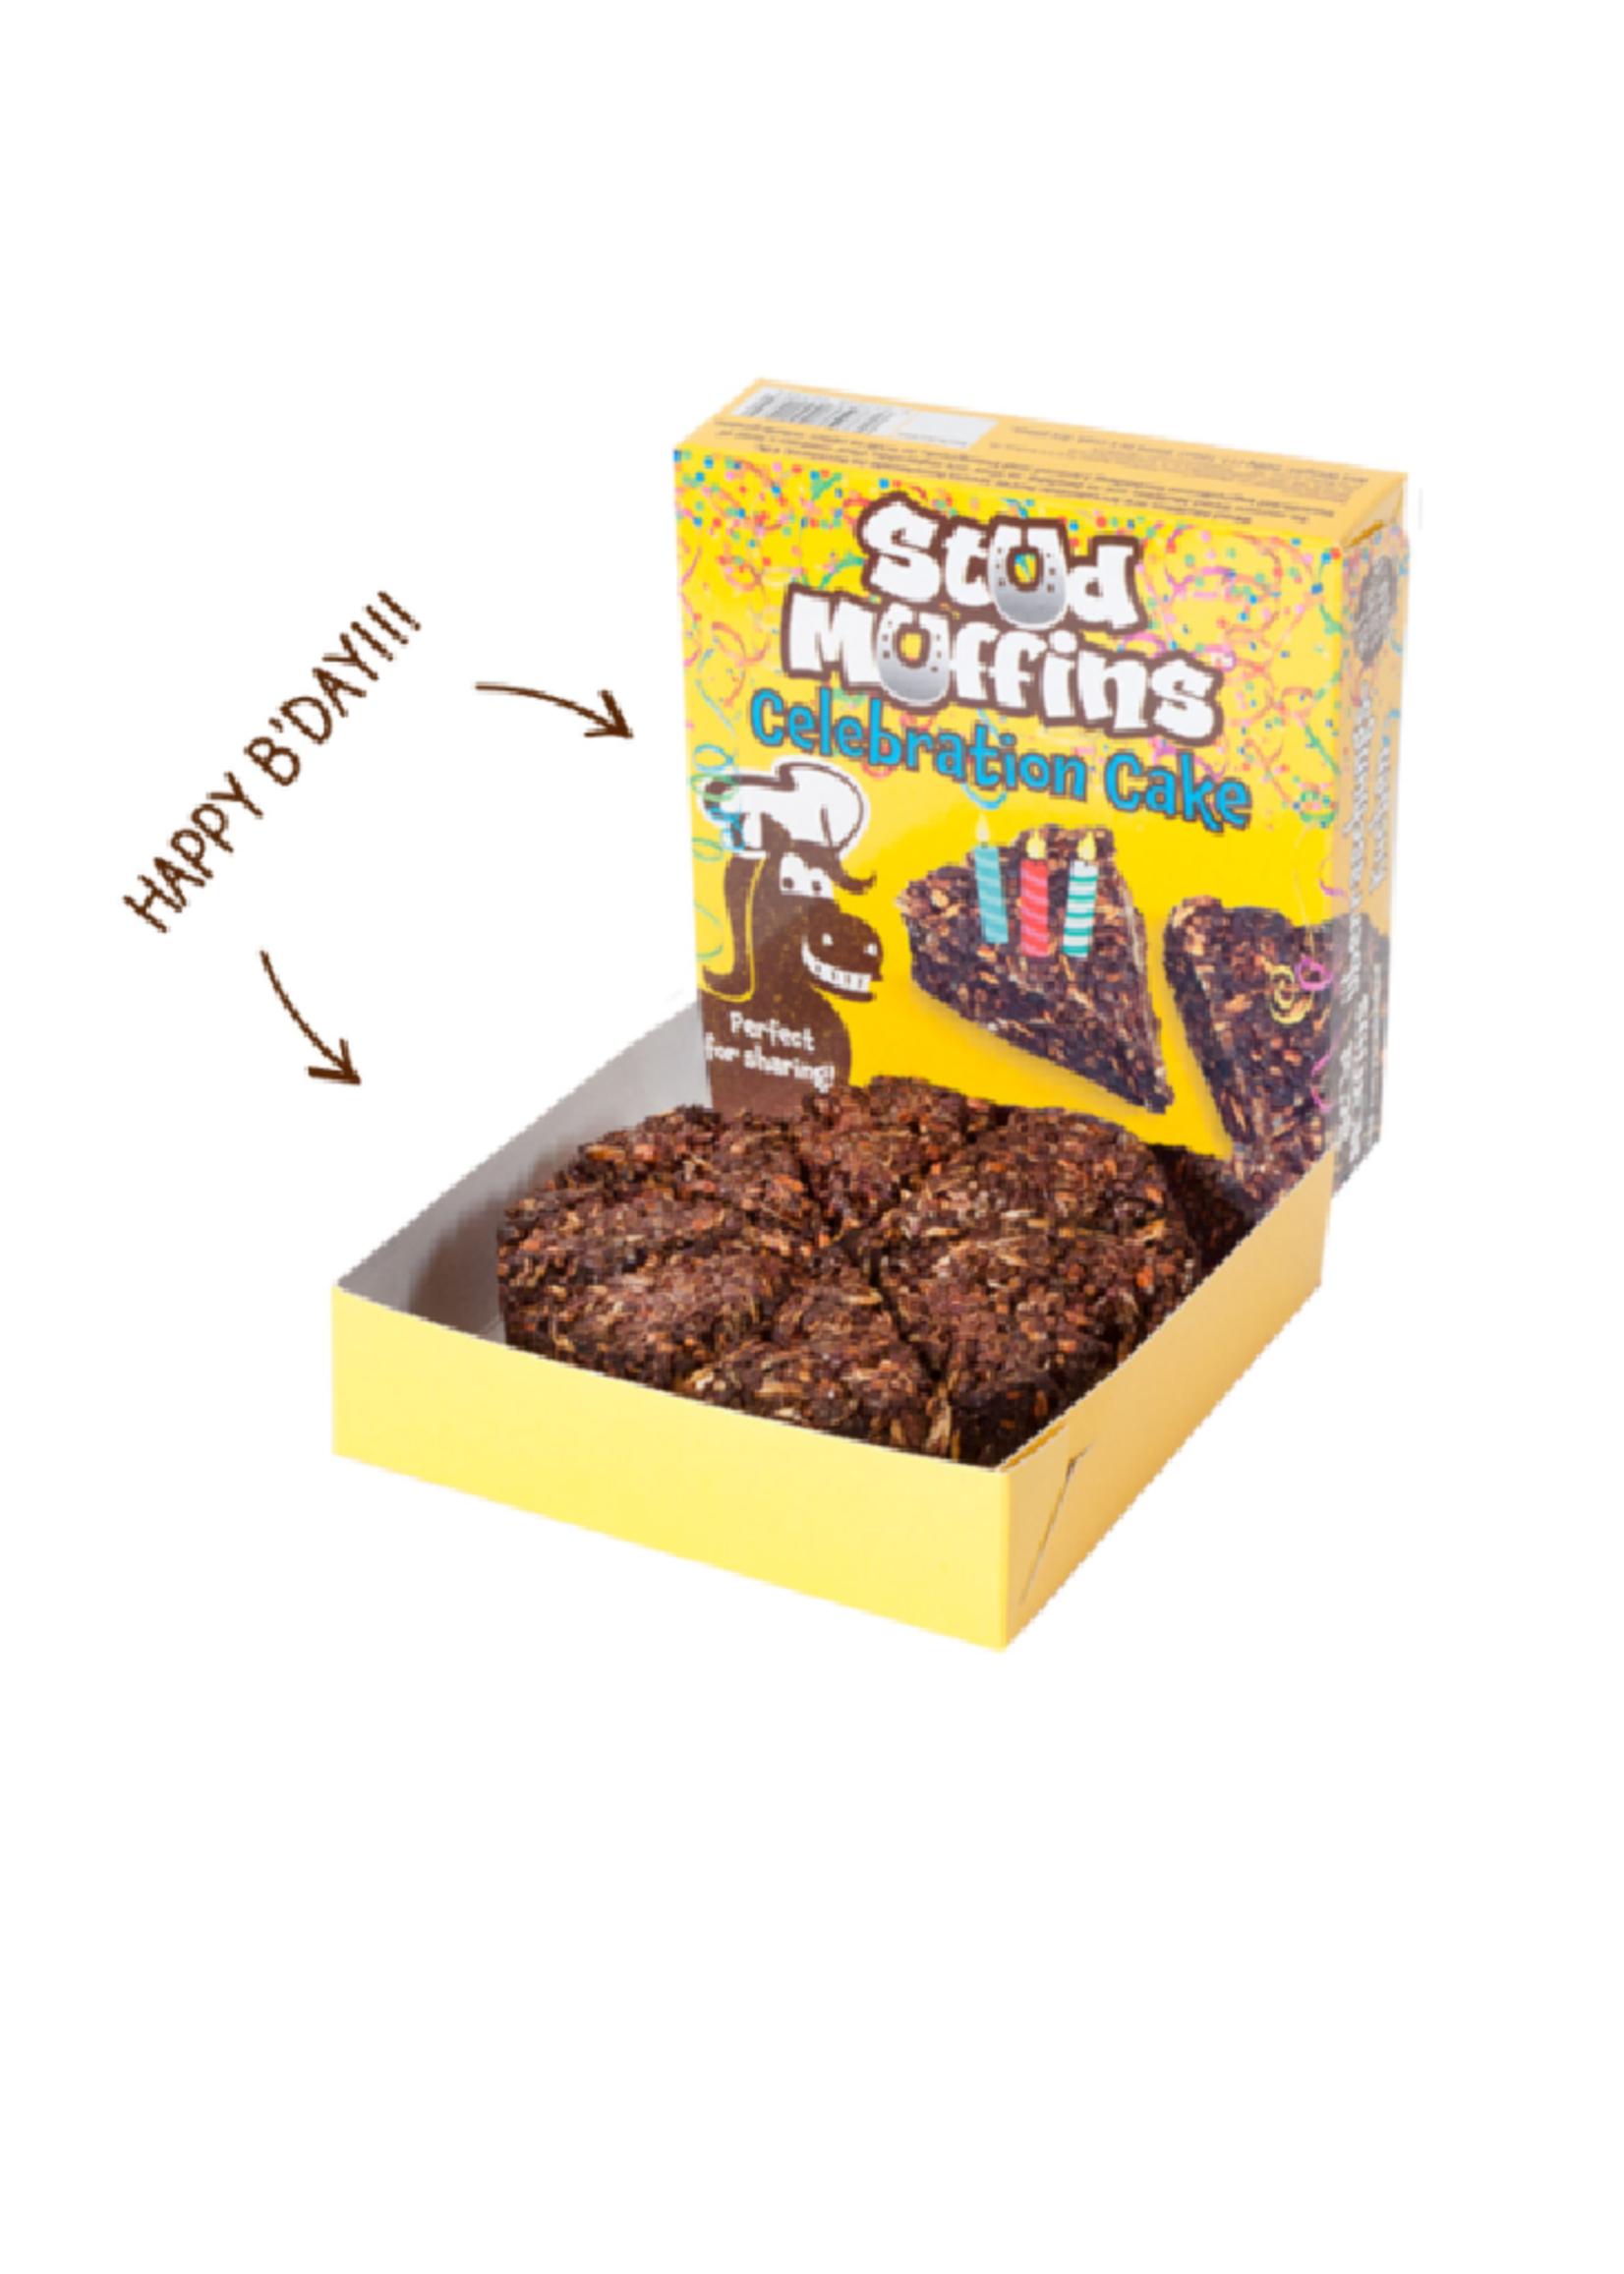 Stud Muffins Stud Muffins Celebration Cake (taart)